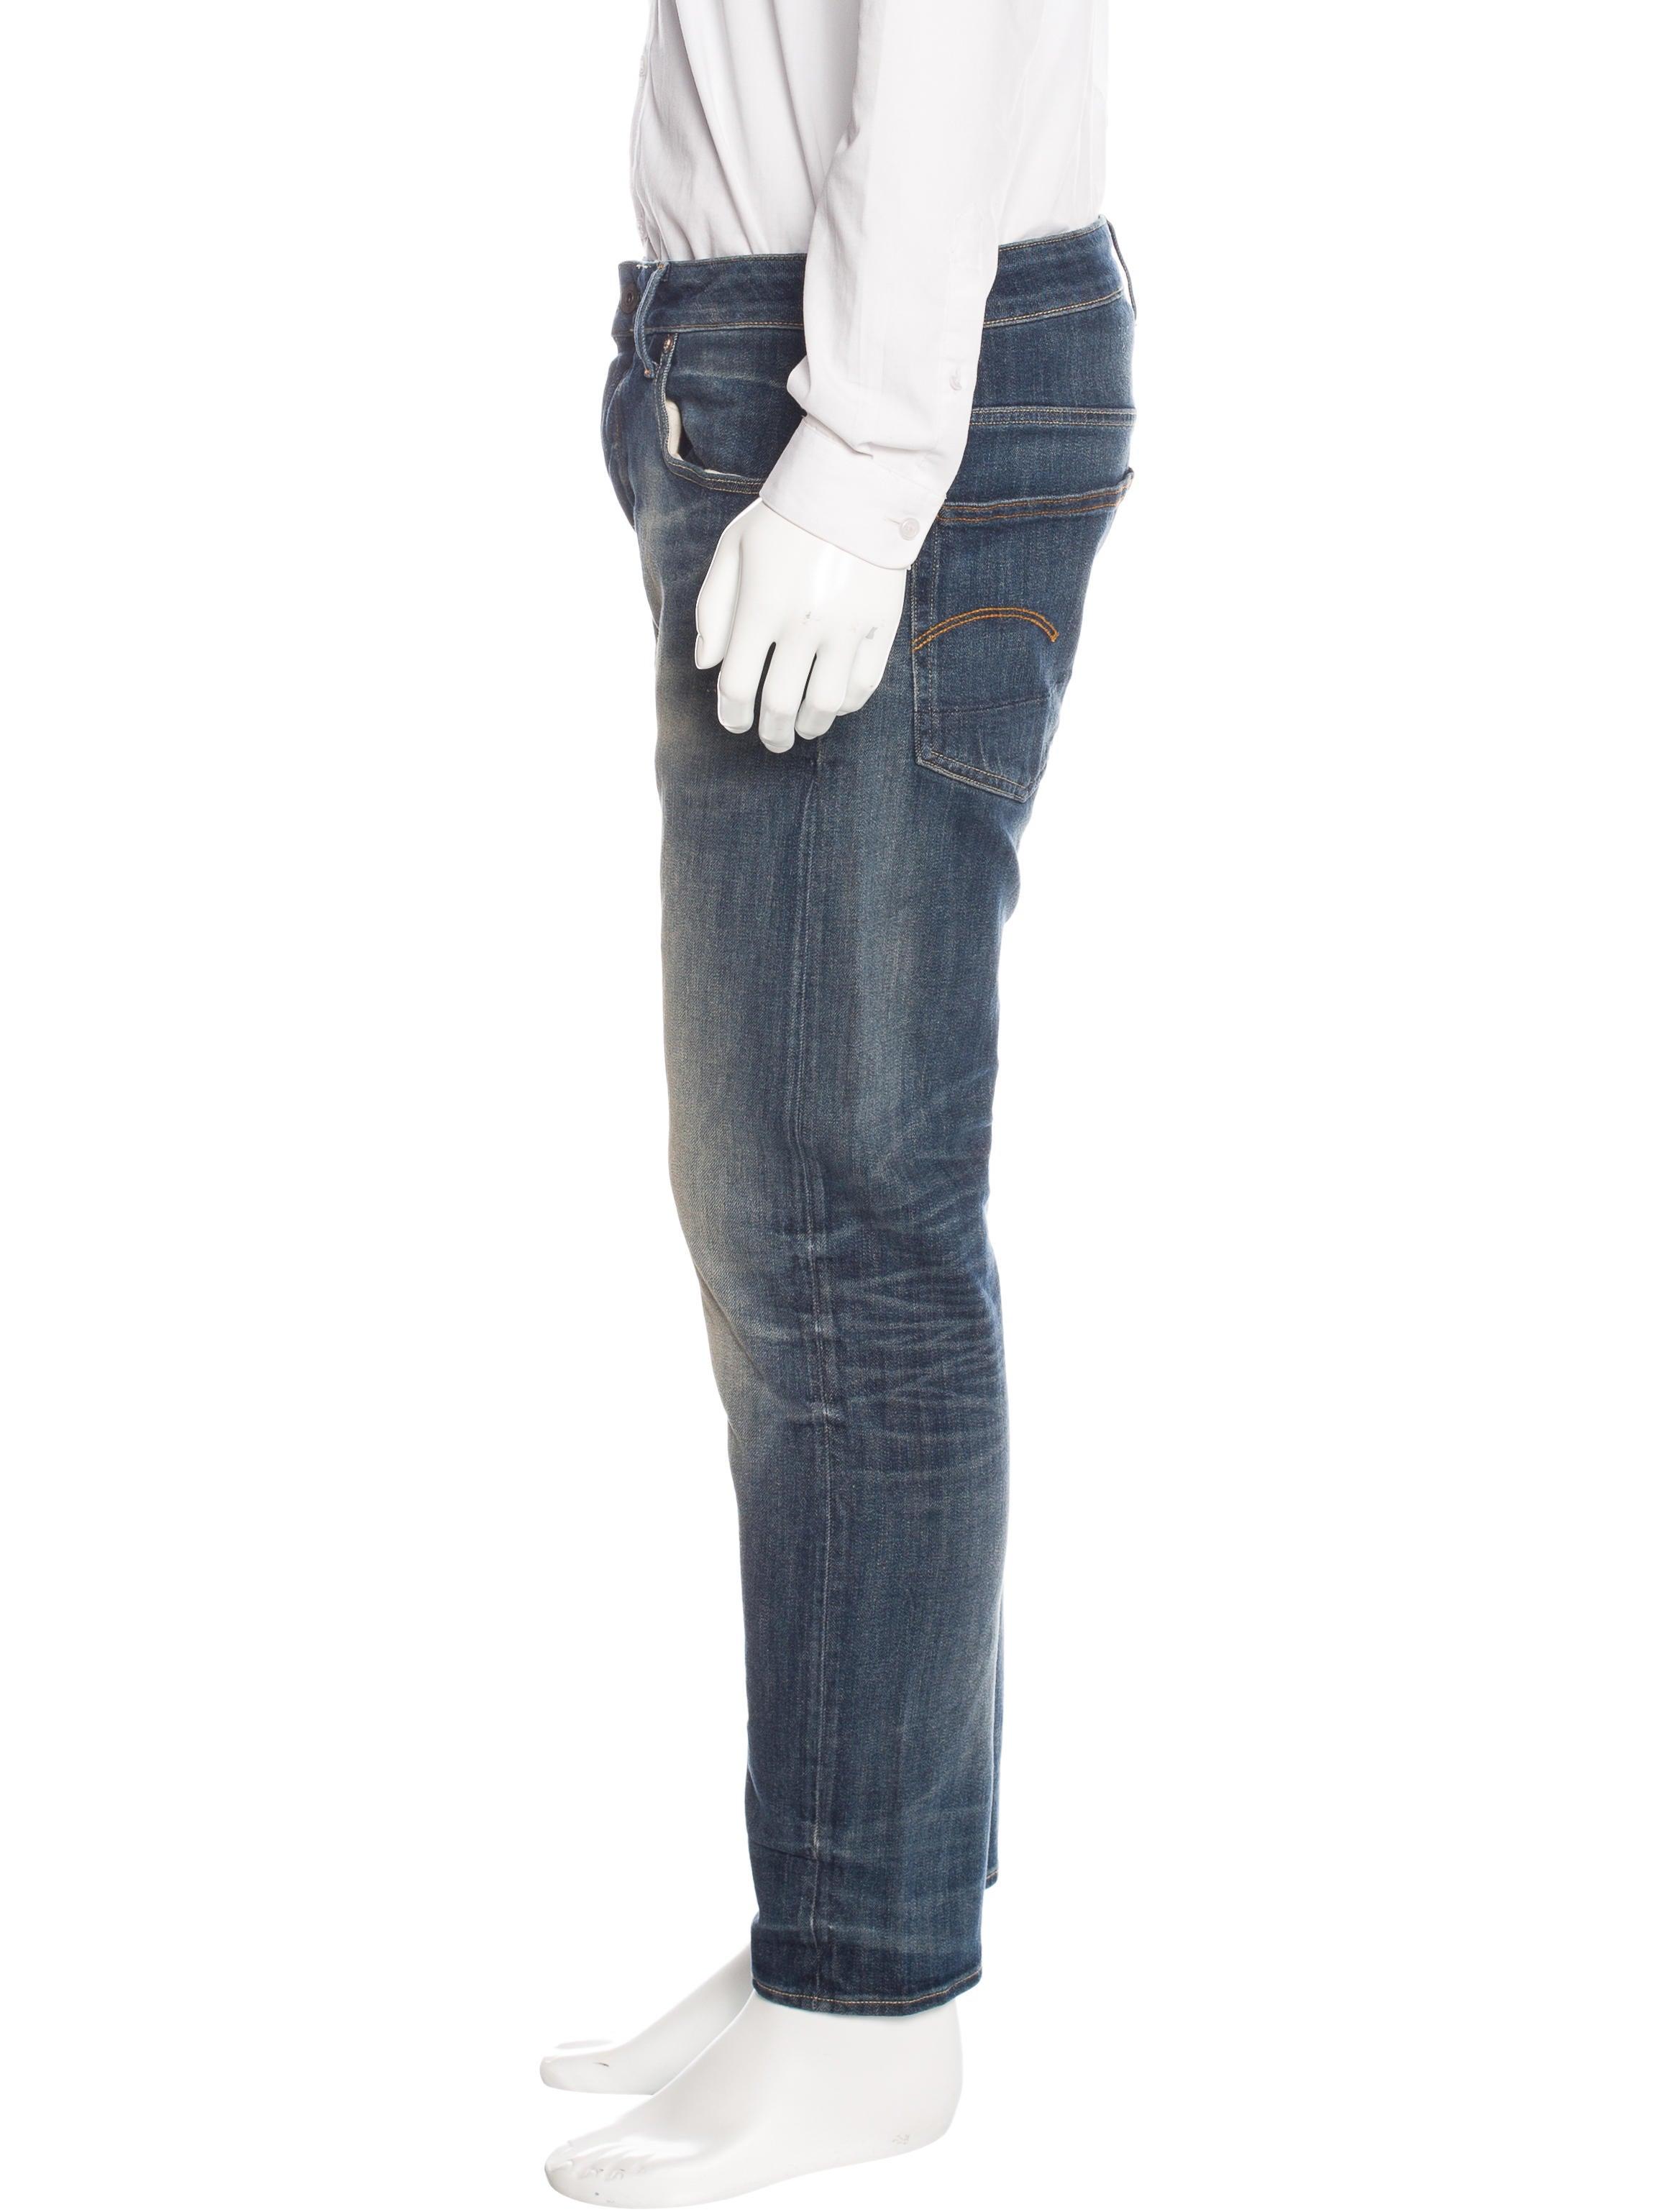 g star raw 3301 slim jeans clothing wgsrw20040 the. Black Bedroom Furniture Sets. Home Design Ideas